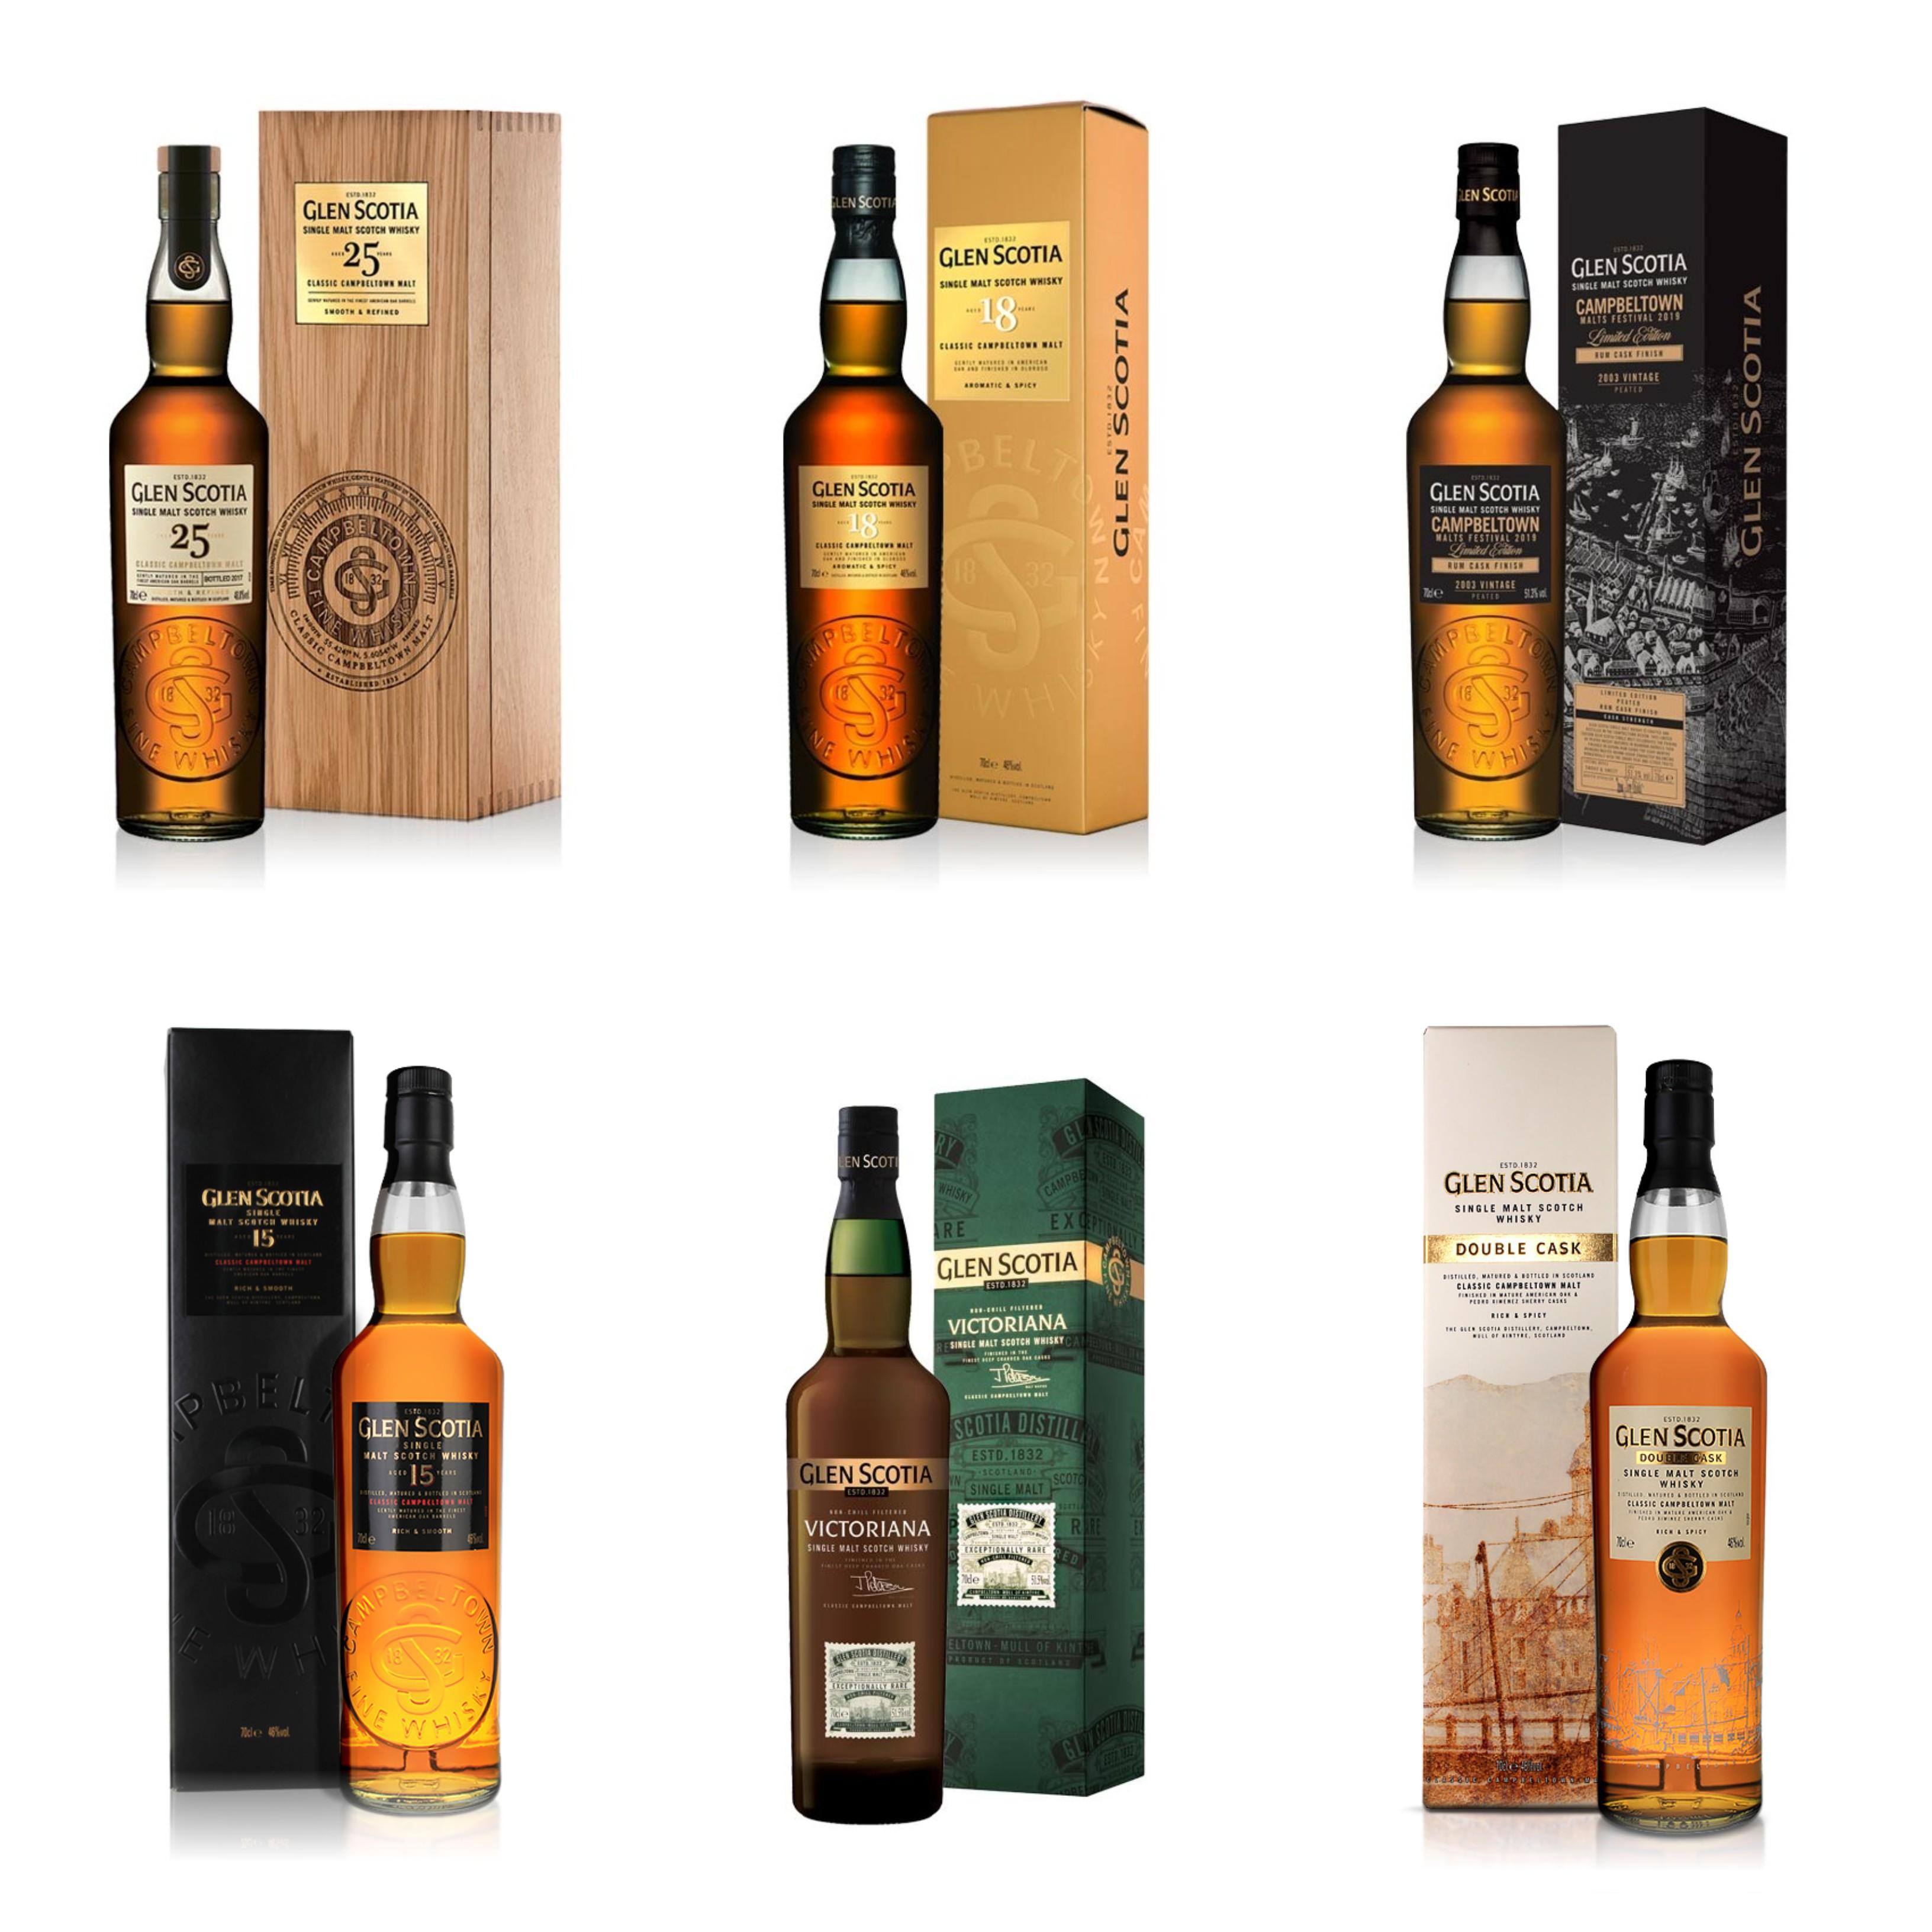 Glen Scotia @ The Whisky Shop